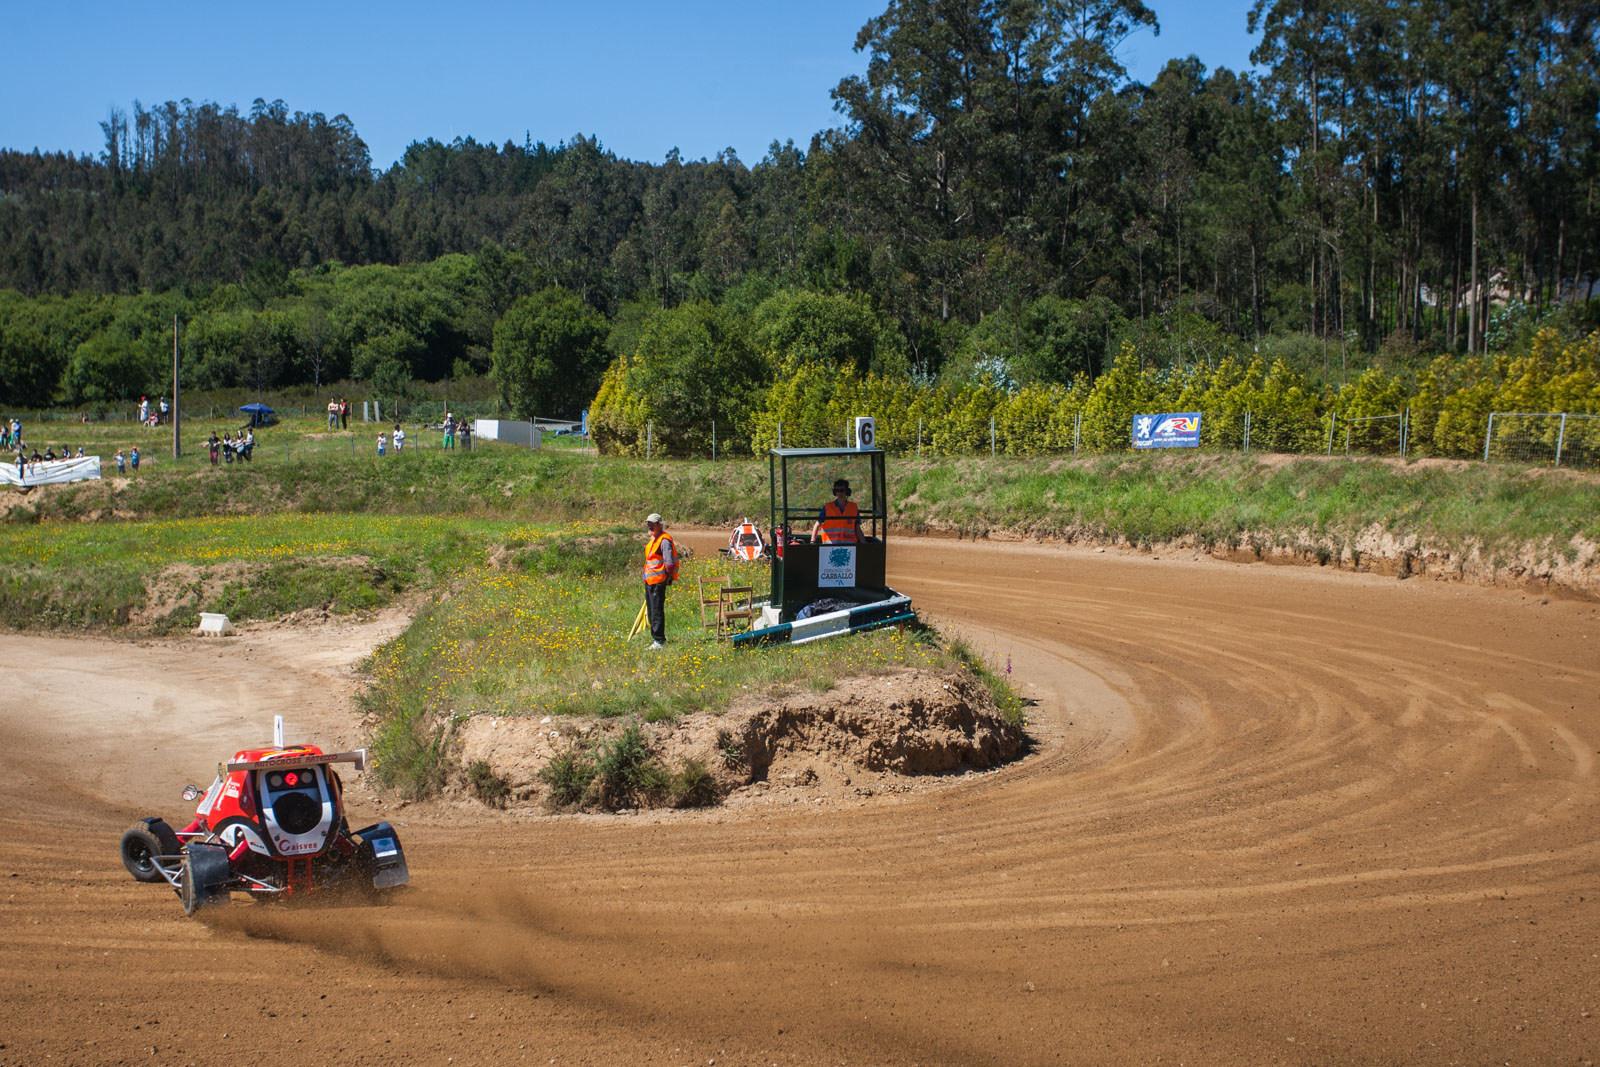 006 Autocross Carballo RFEDA 2016 020